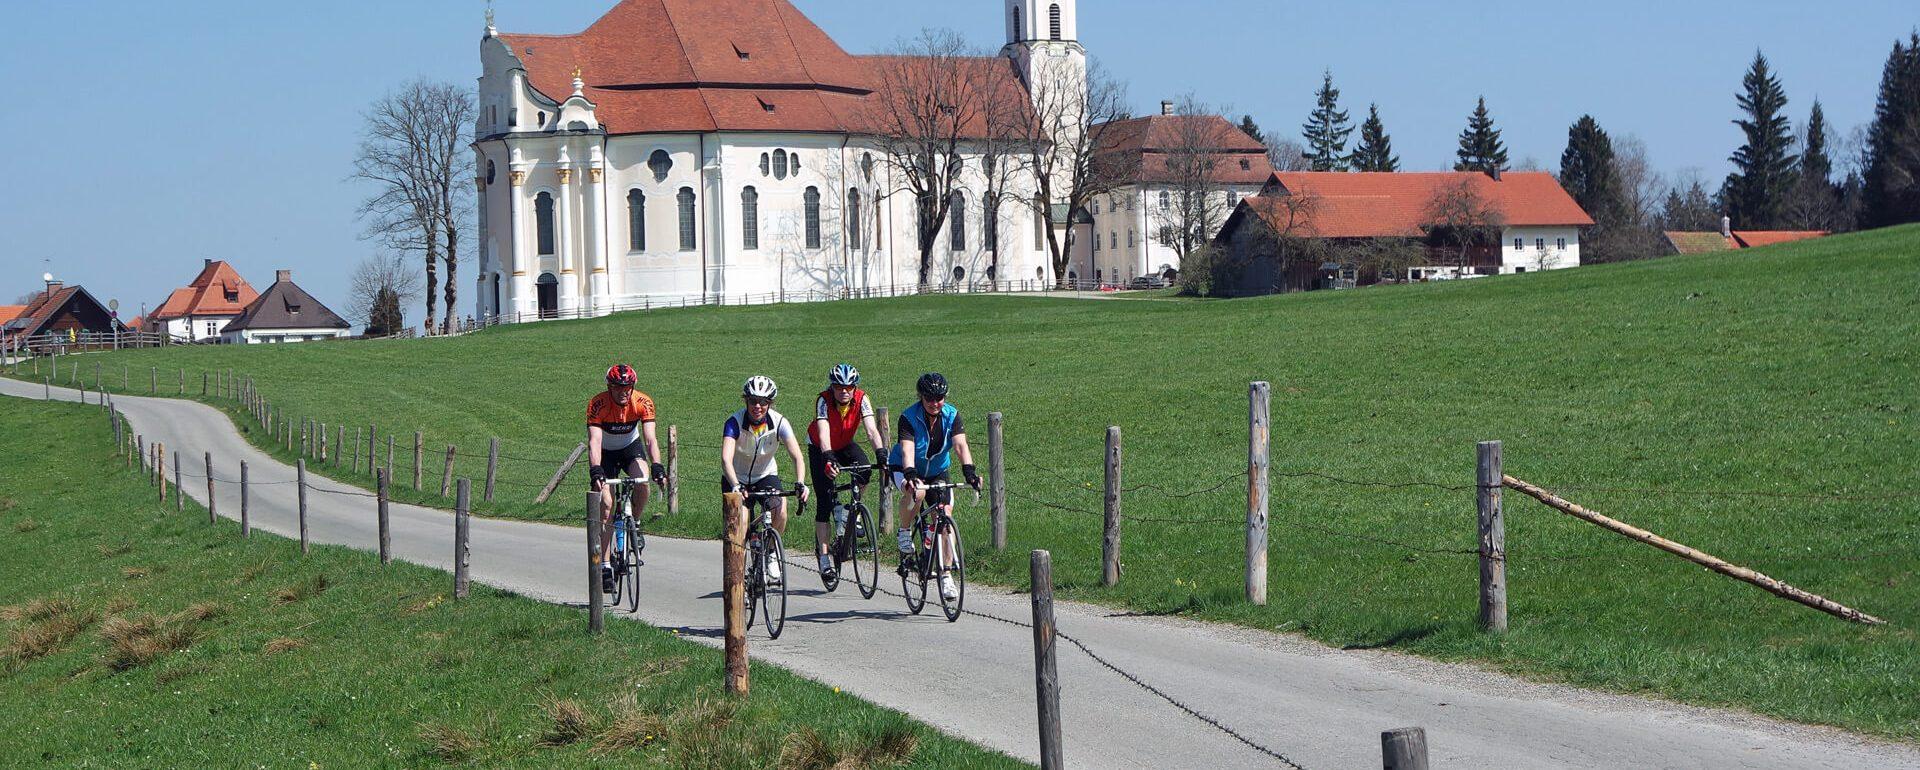 Rennradtouren im Allgäu © Allgäu GmbH